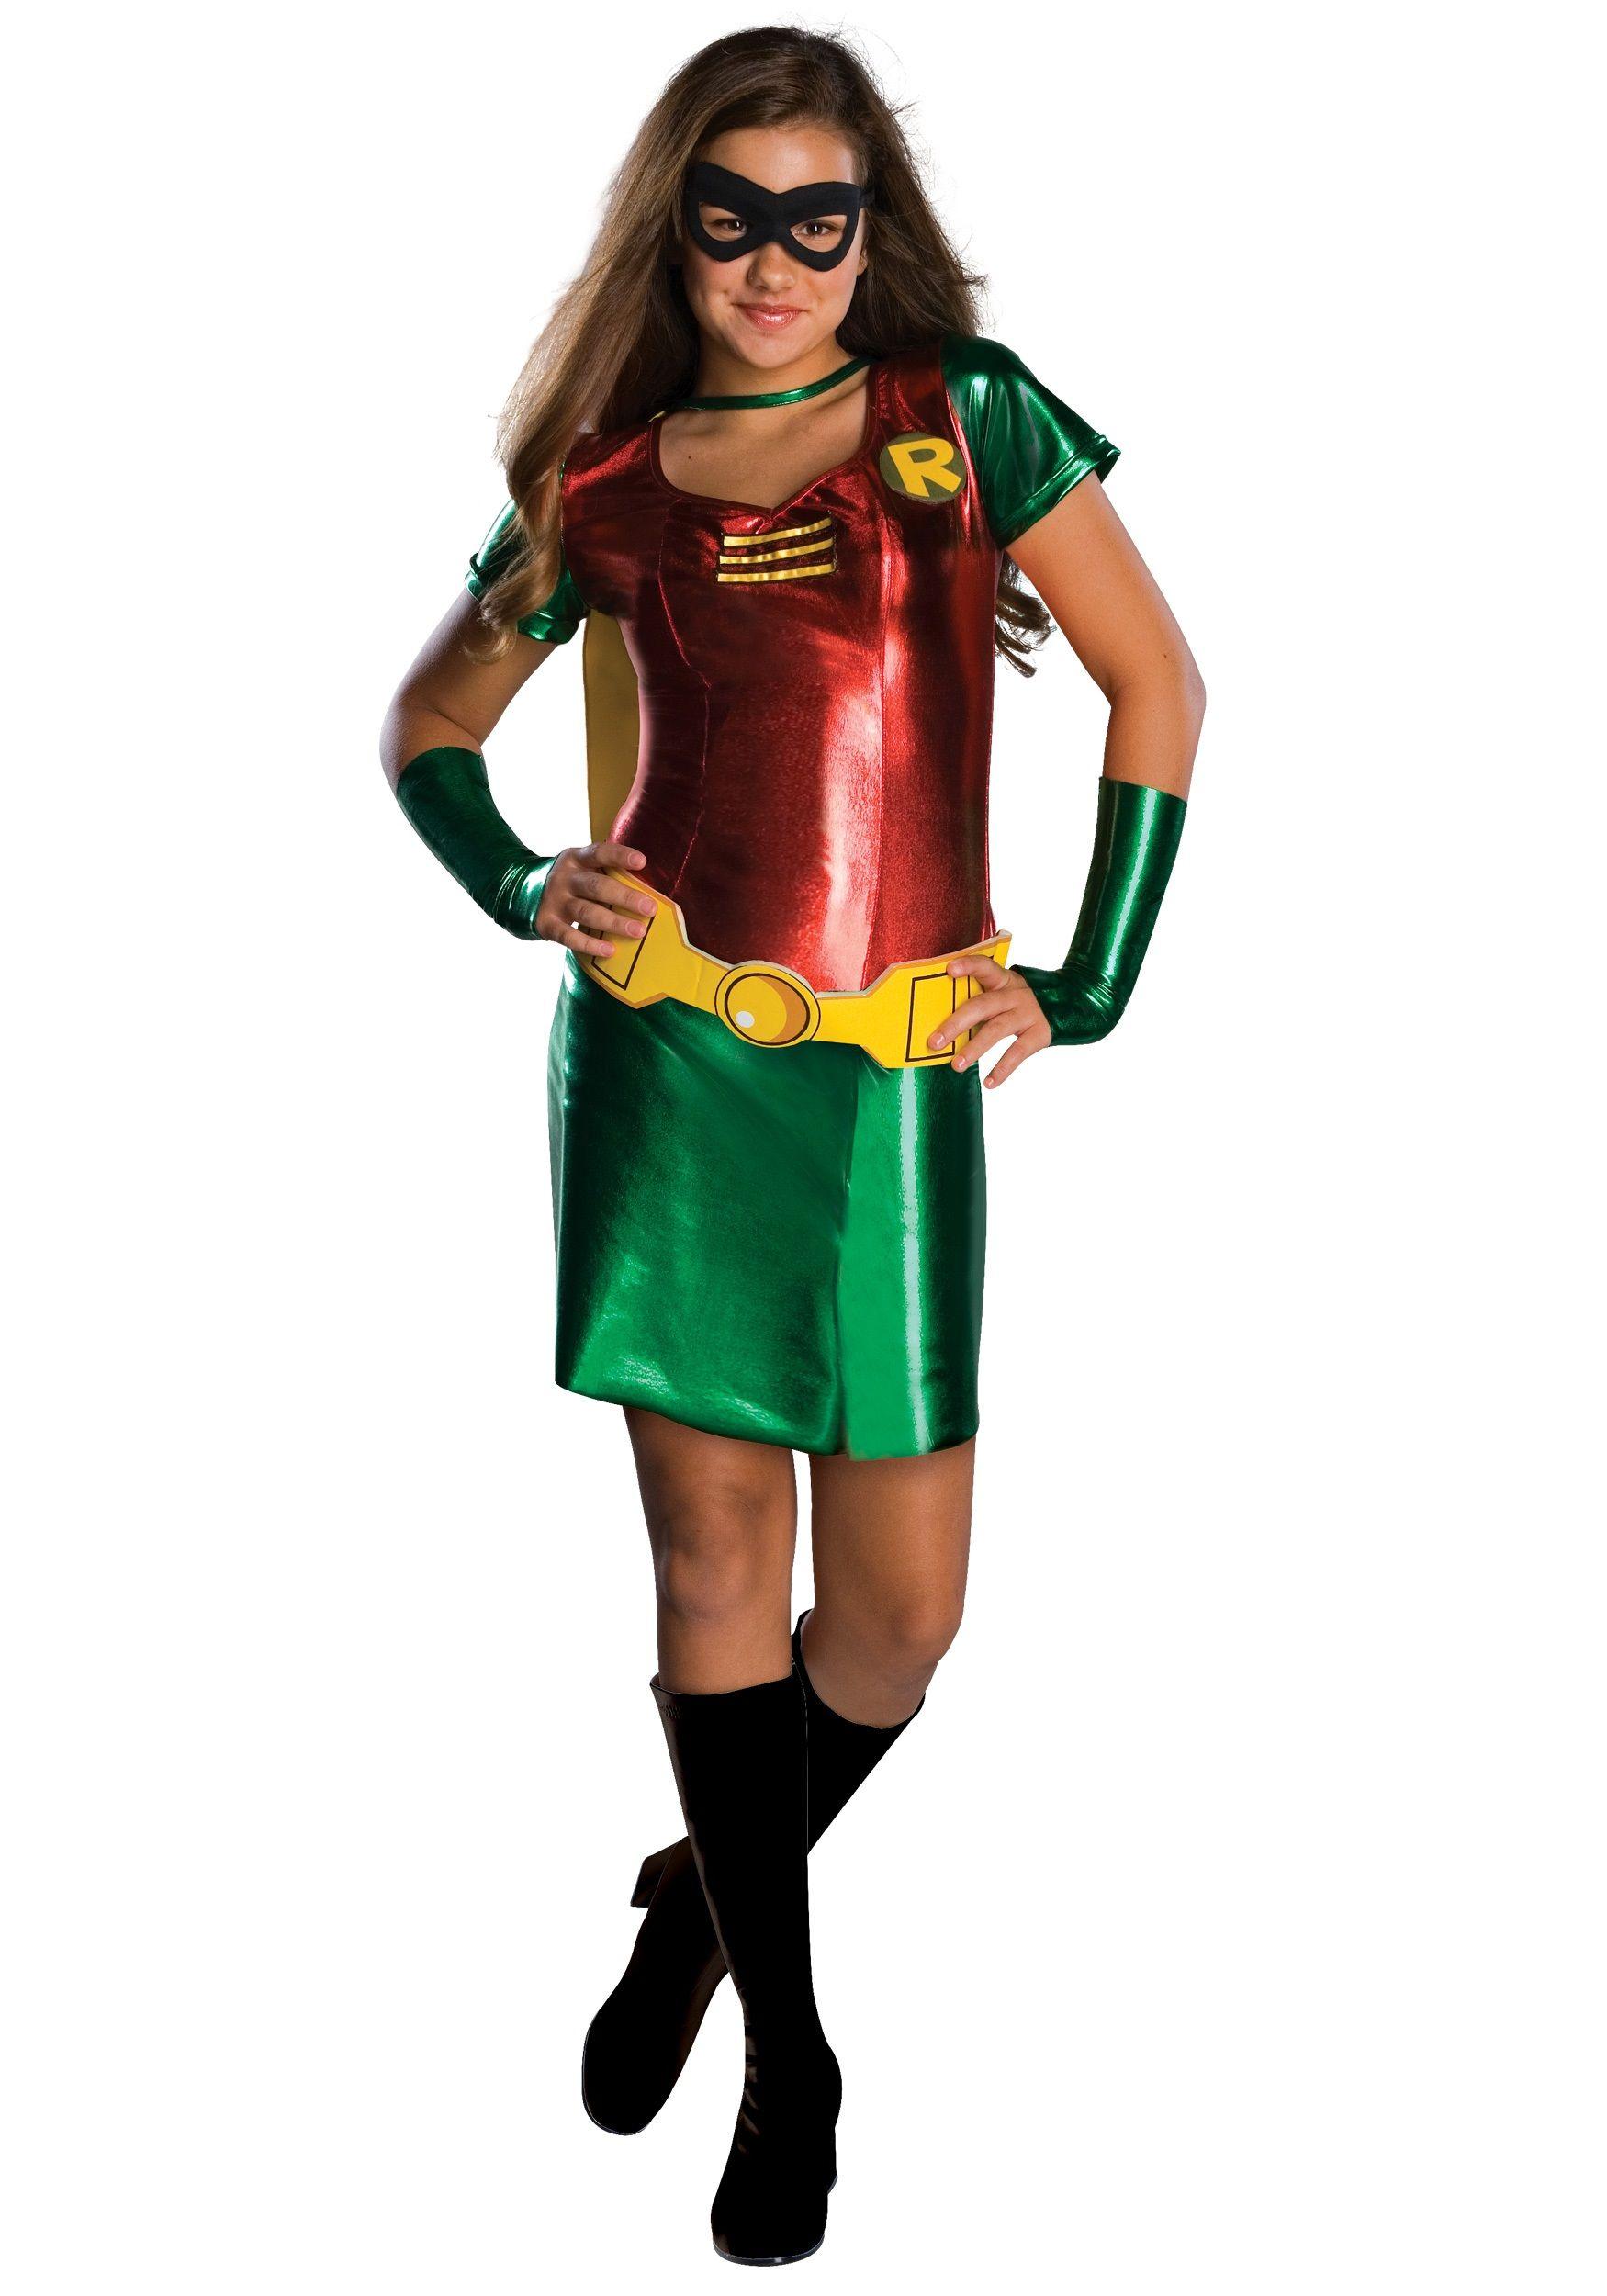 Tween Girls Robin Costume | Robin: girl instead of gay | Pinterest ...